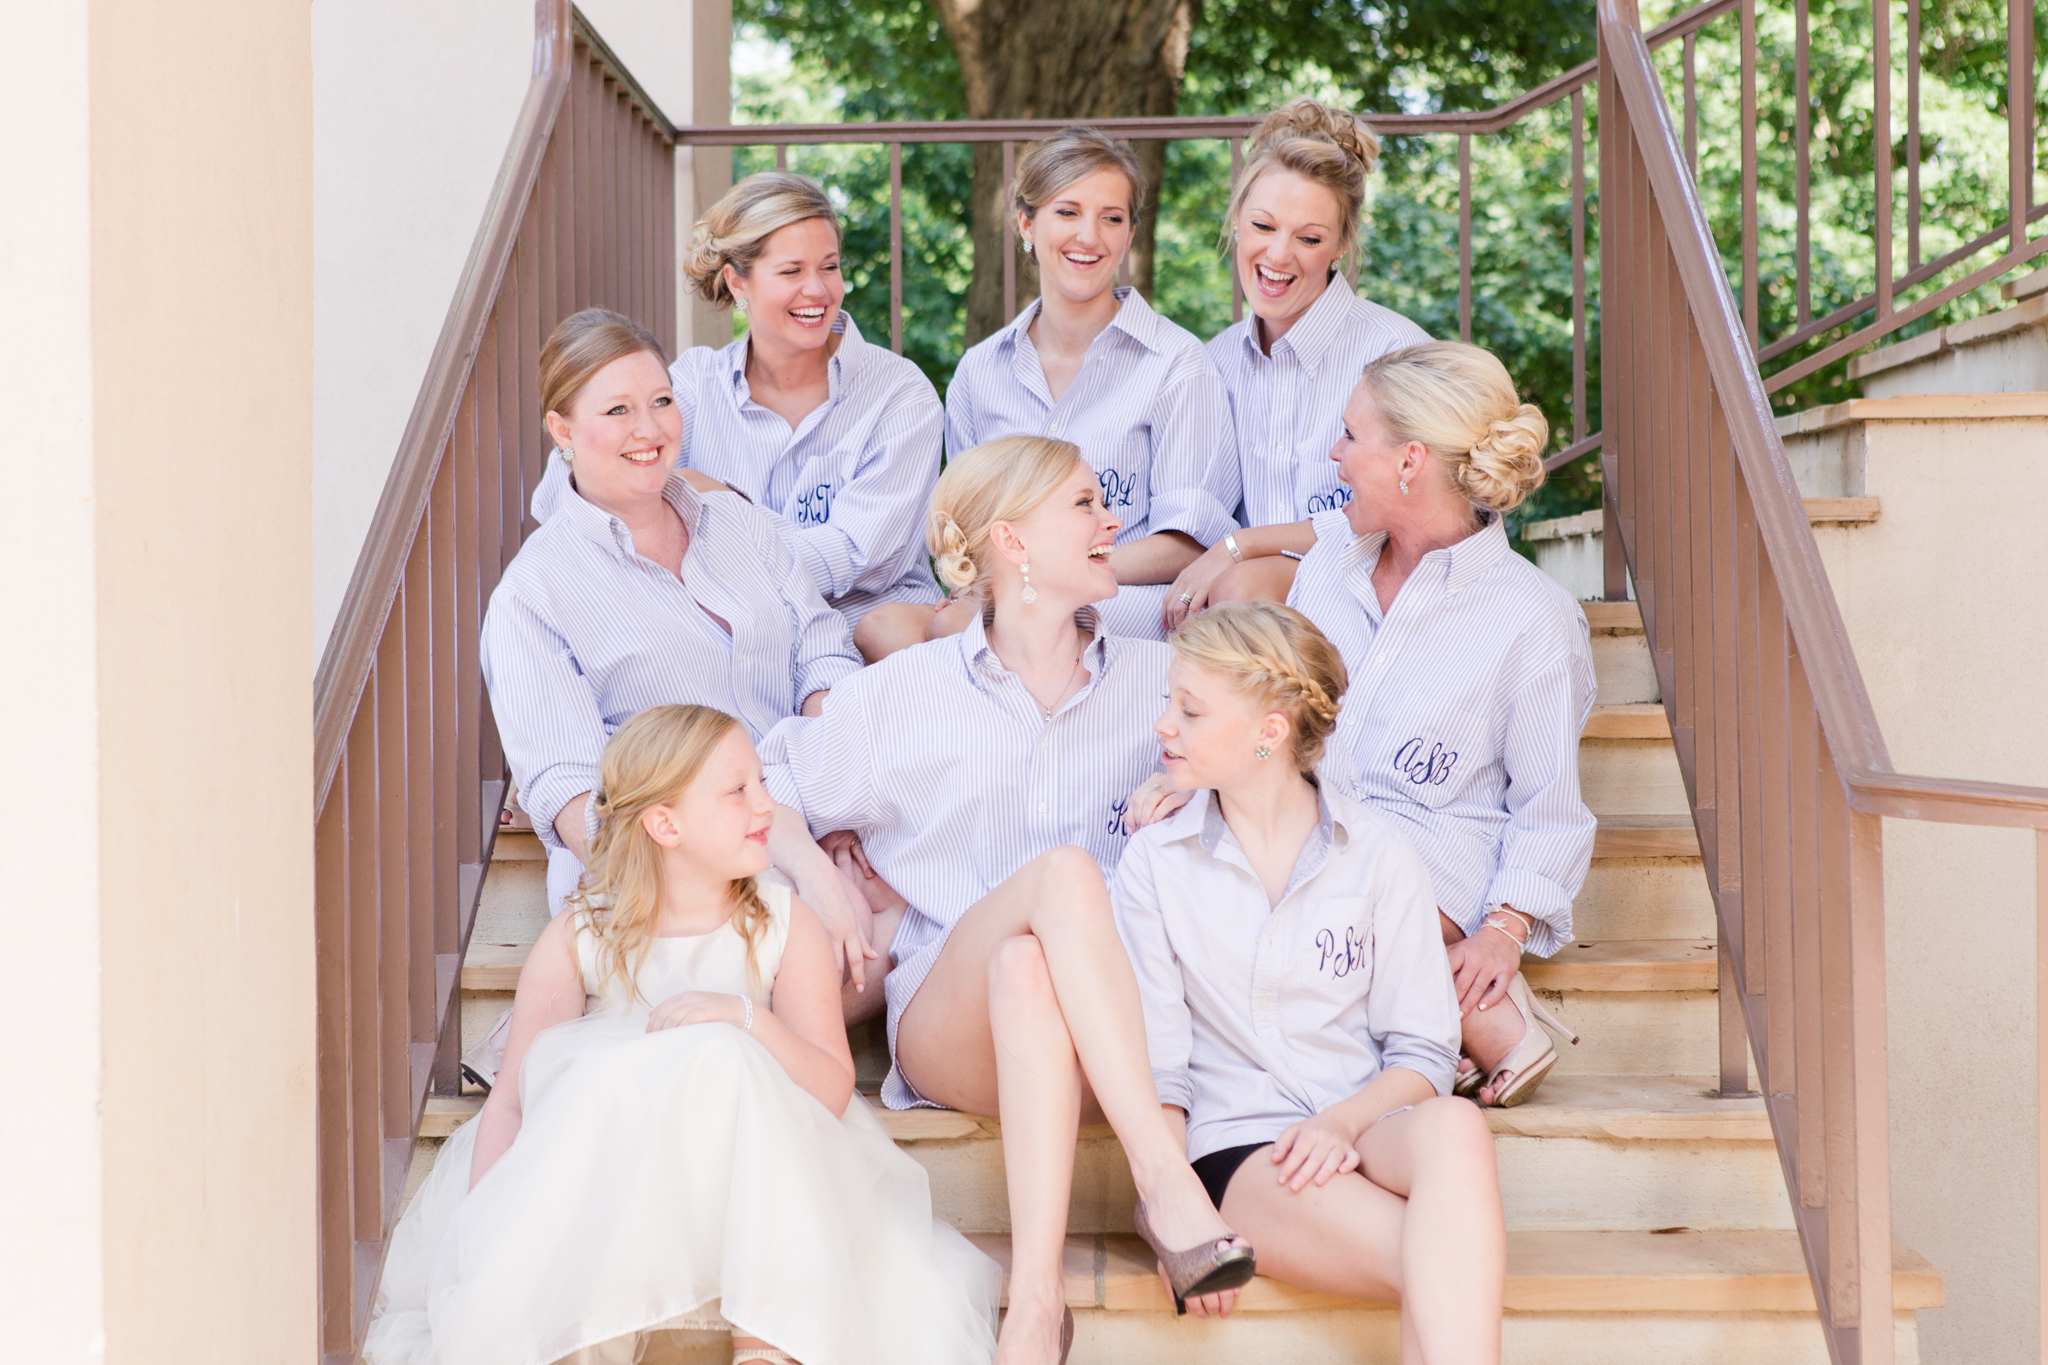 Ashley-Amber-Photo-Outdoor-Wedding-Photography-160430.jpg